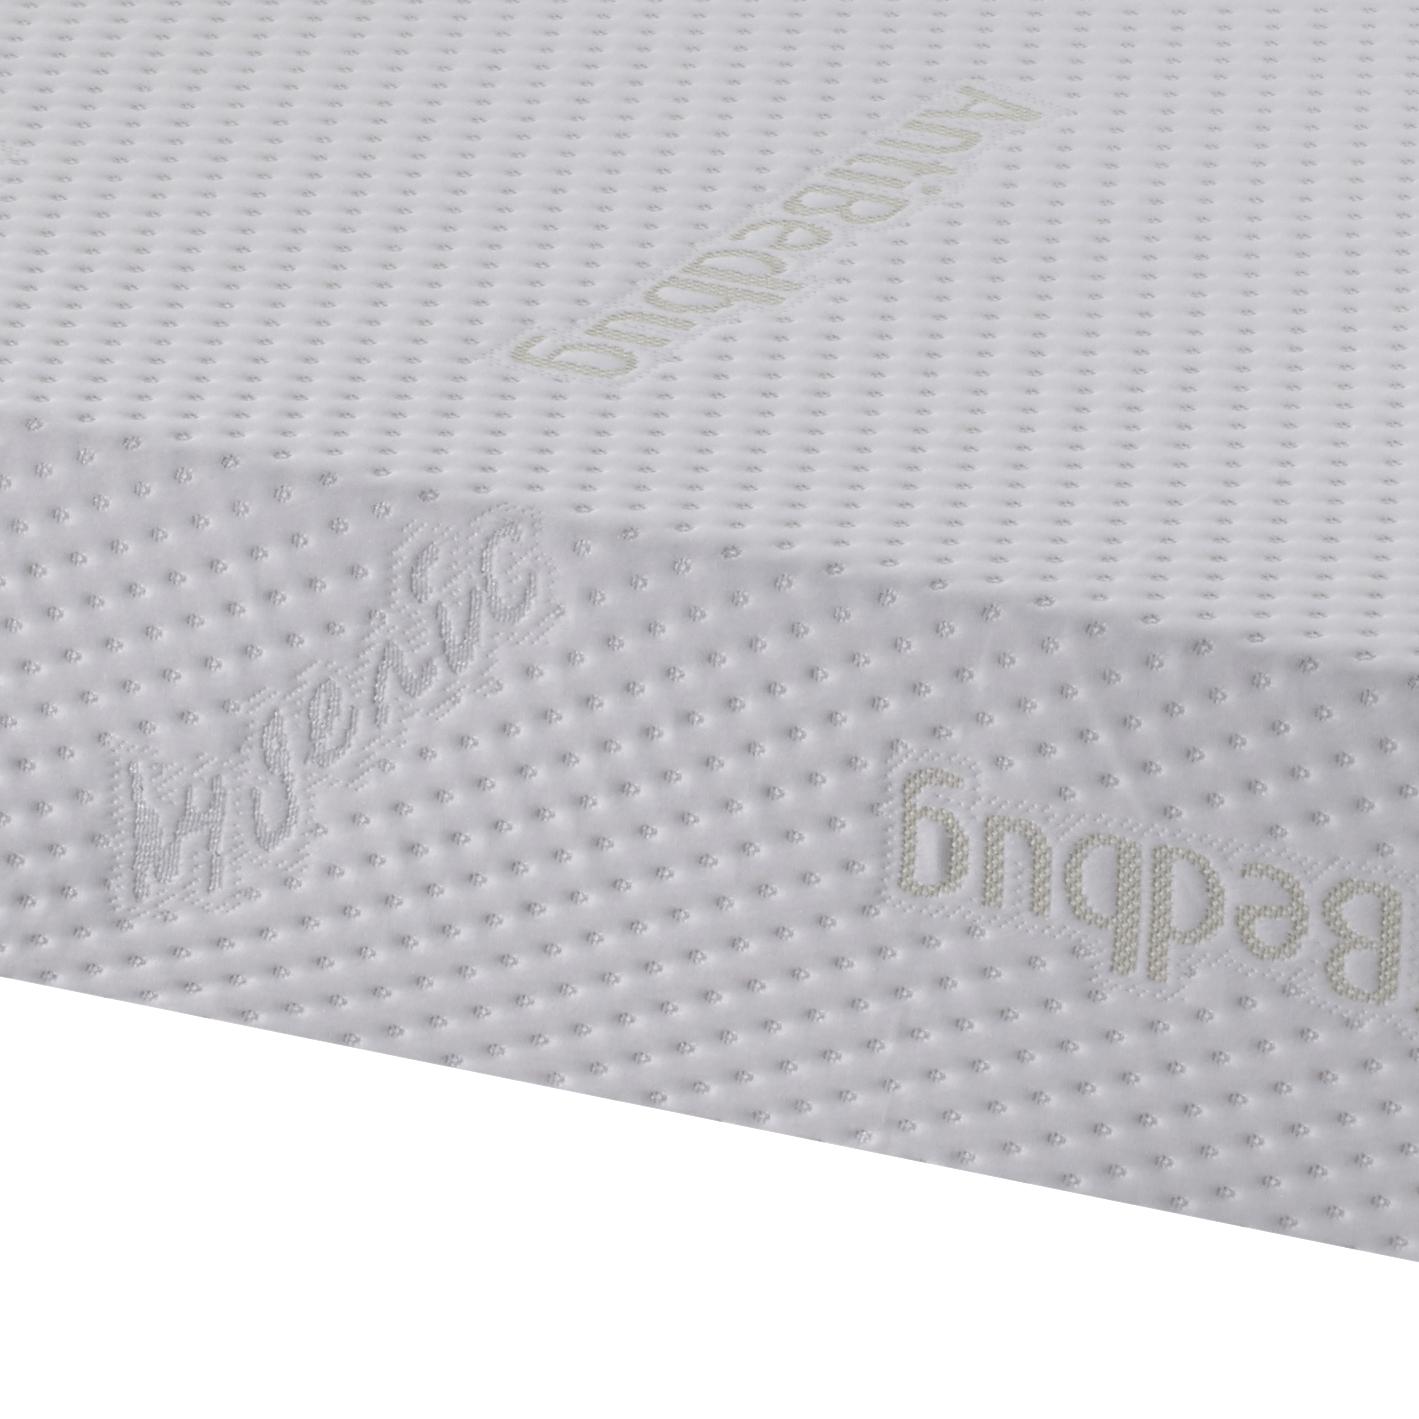 Pureflex Anti Bed Bug Memory Foam Certipur Nbf Mattress